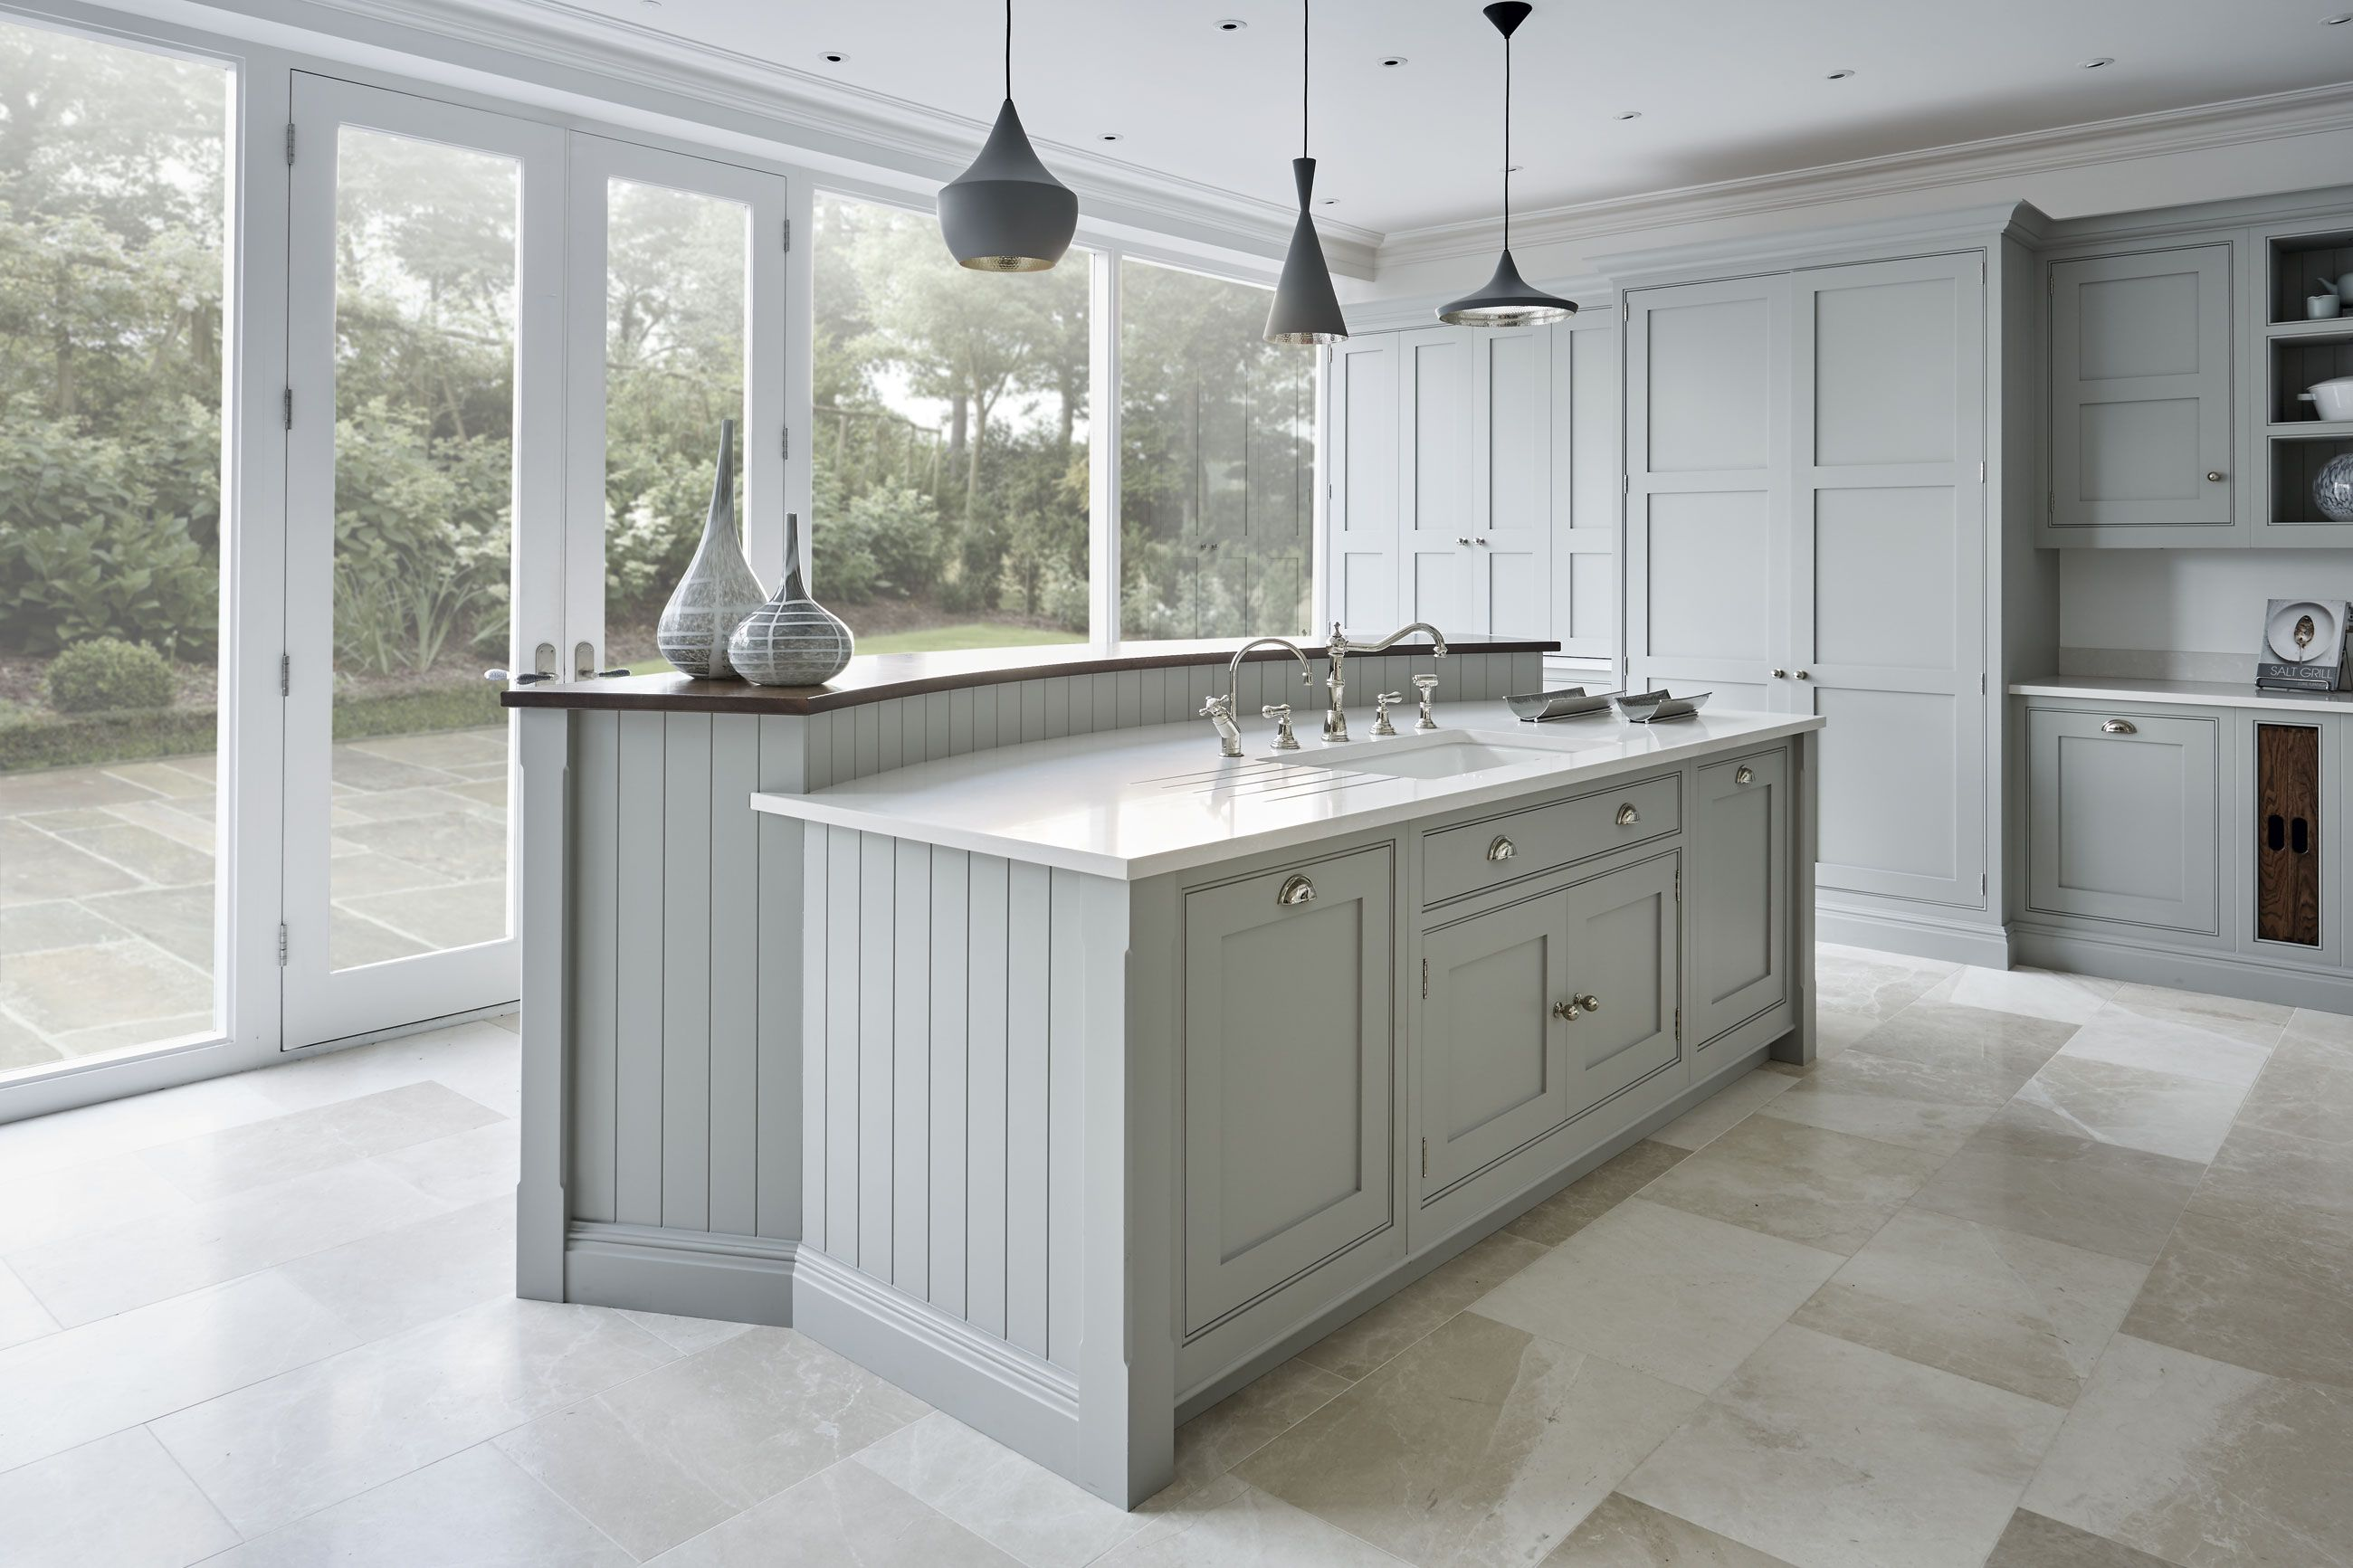 Bespoke Kitchens  Luxury Kitchen Designers  Tom Howley  Home Glamorous Luxury Kitchen Designers 2018